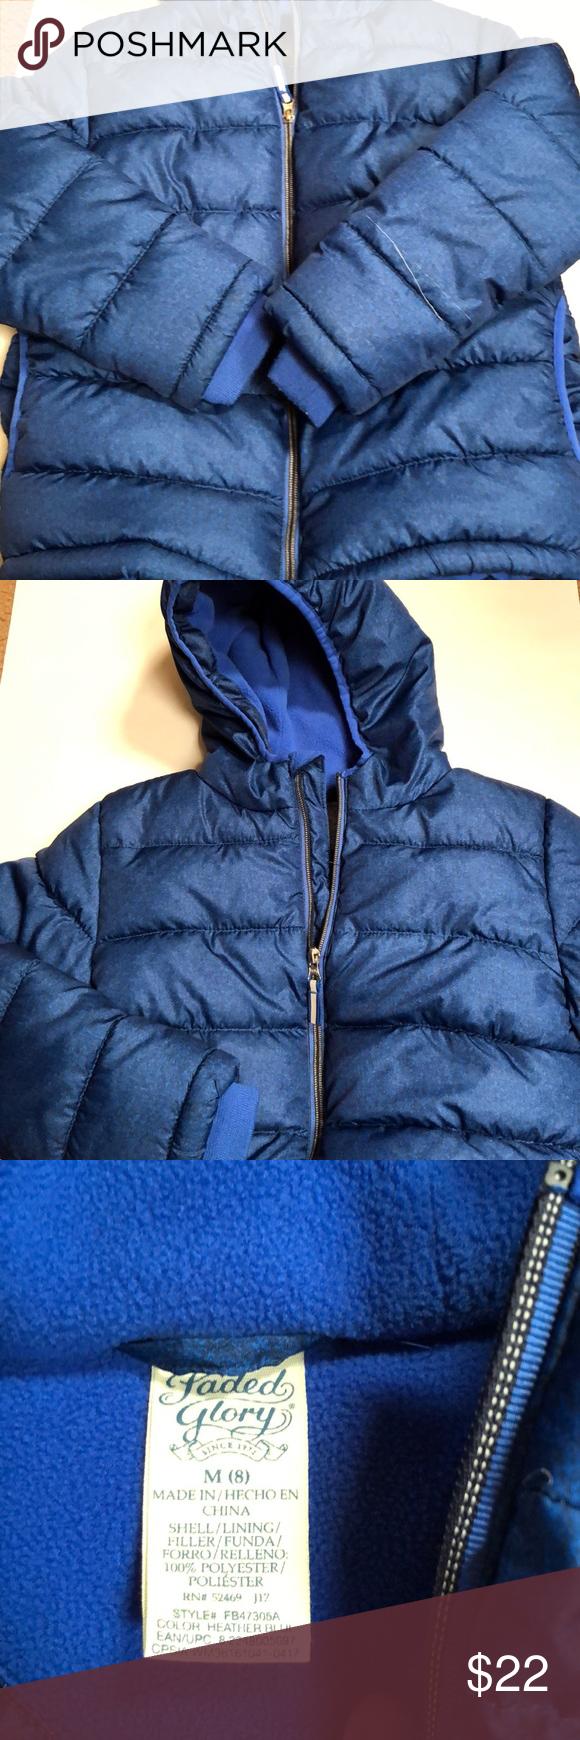 Boys Winter Puffer Jacket Warm Blue Zip Up Puffer Jacket Only Worn A Few Times Only Flaw Is A Couple Tread Pulls Winter Puffer Jackets Jackets Puffer Jackets [ 1740 x 580 Pixel ]